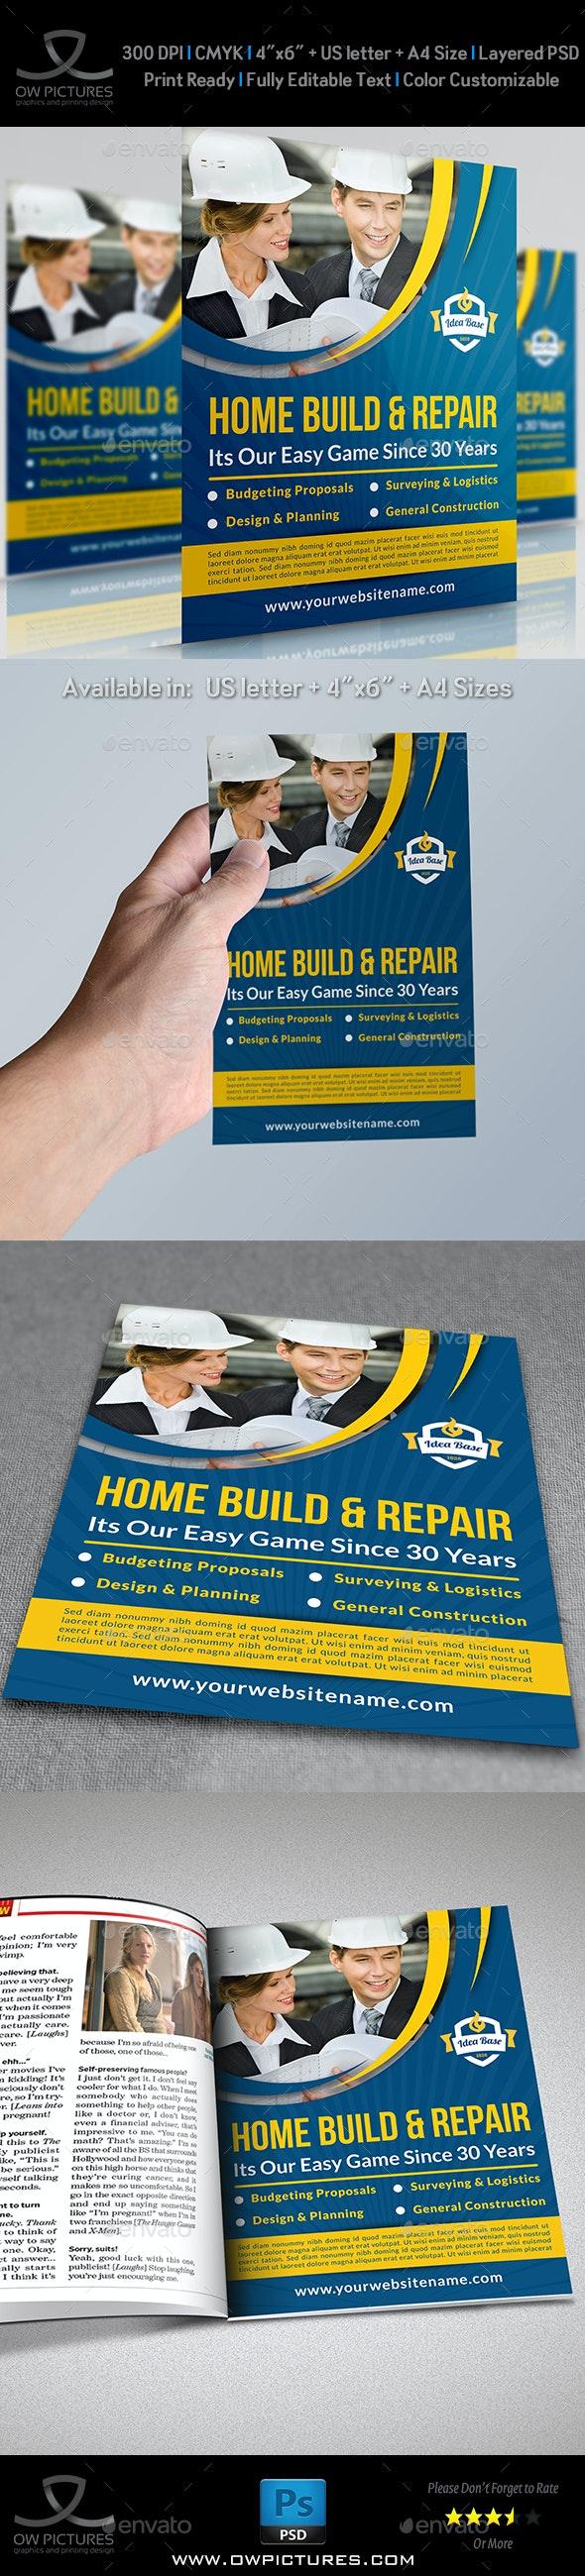 Construction Business Flyer Vol.3 - Corporate Flyers